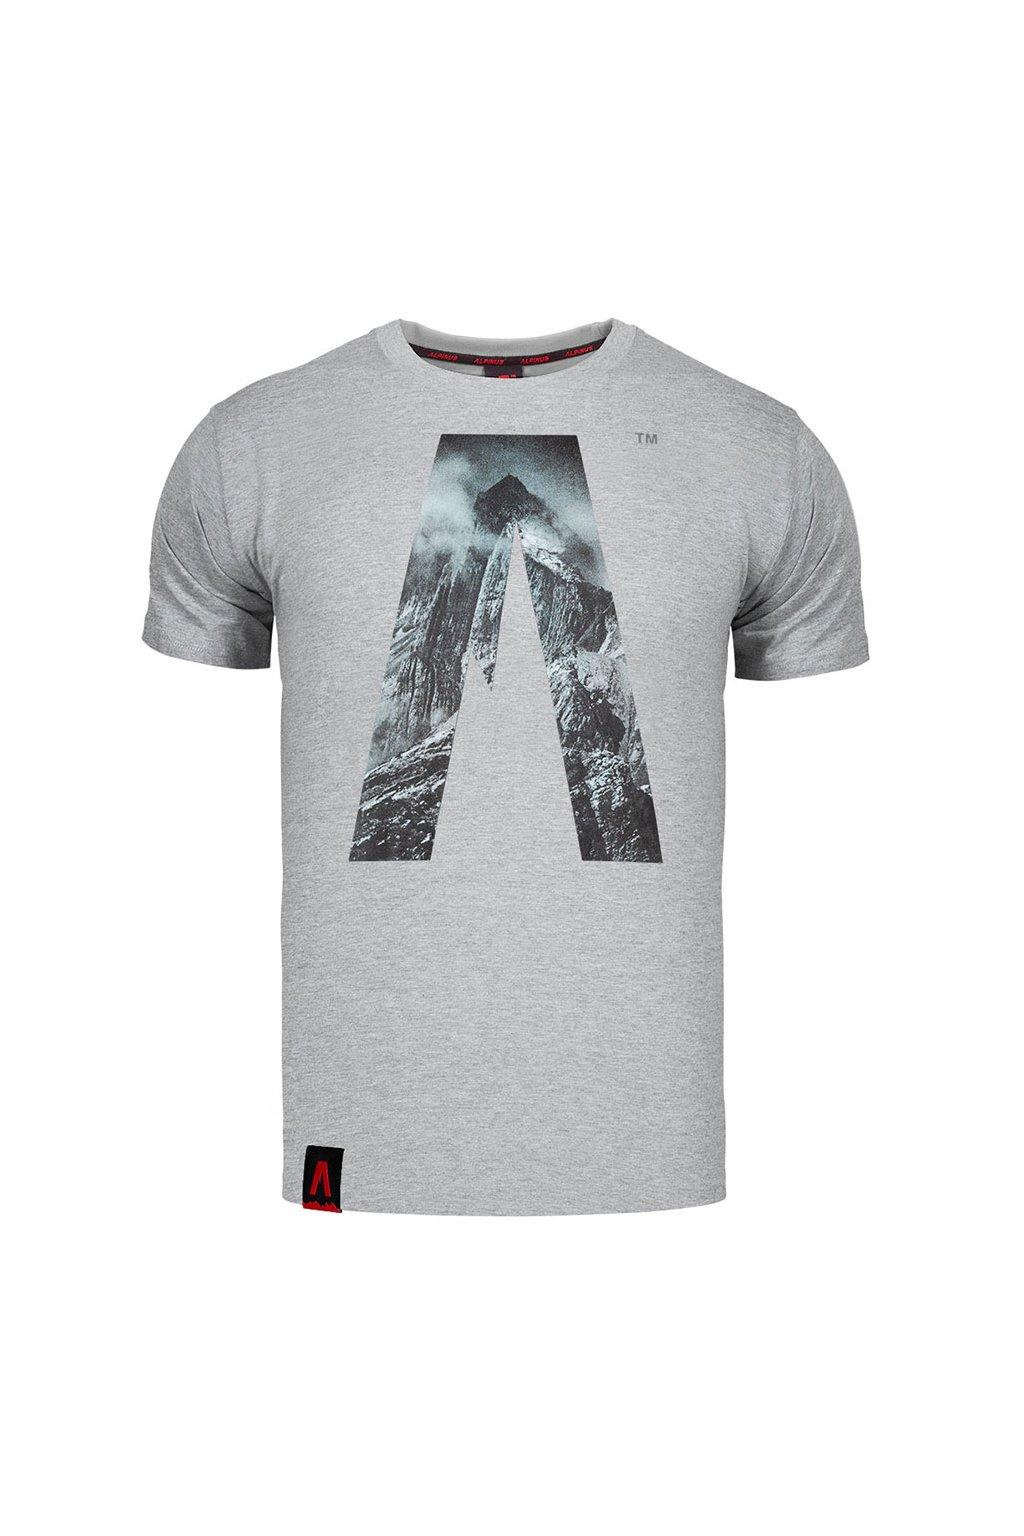 Pánske tričko Alpinus Peak sivé ALP20TC0039